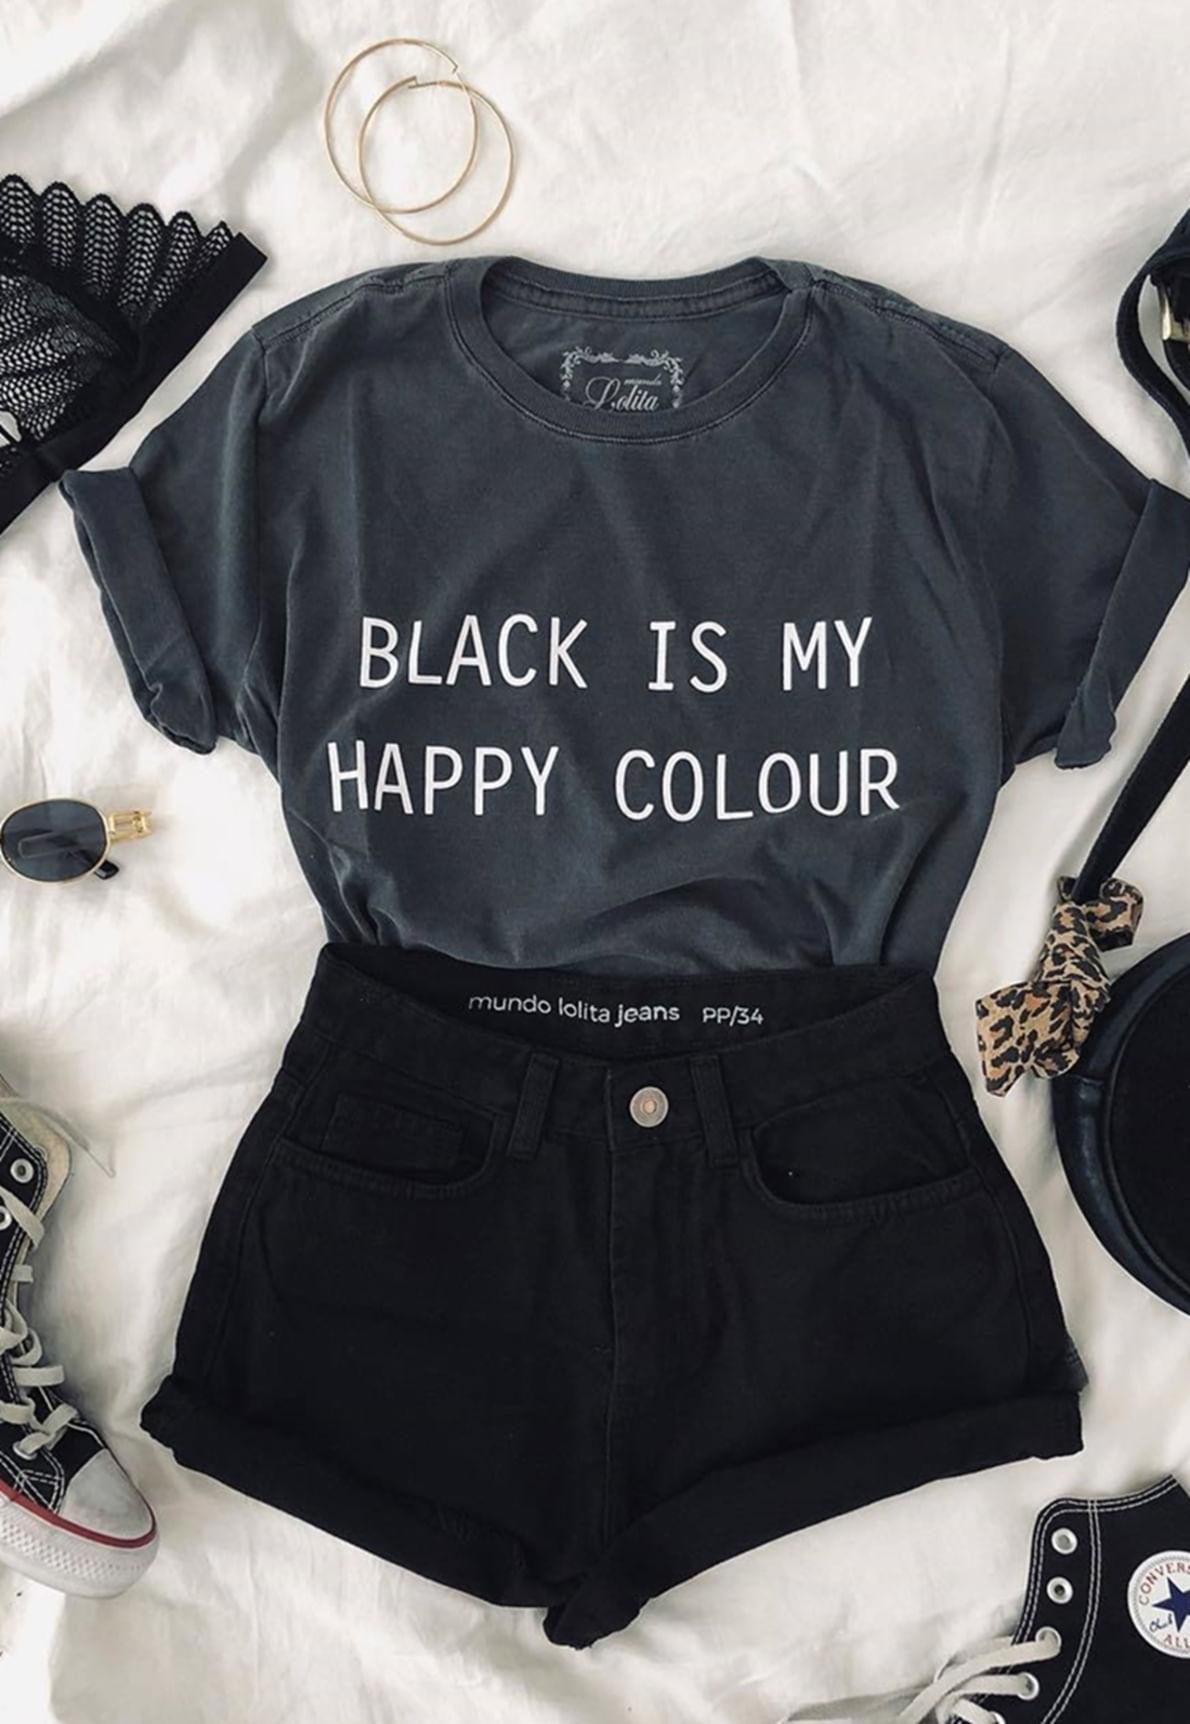 25380-t-shirt-happy-is-my-happy-colour-mundo-lolita-01